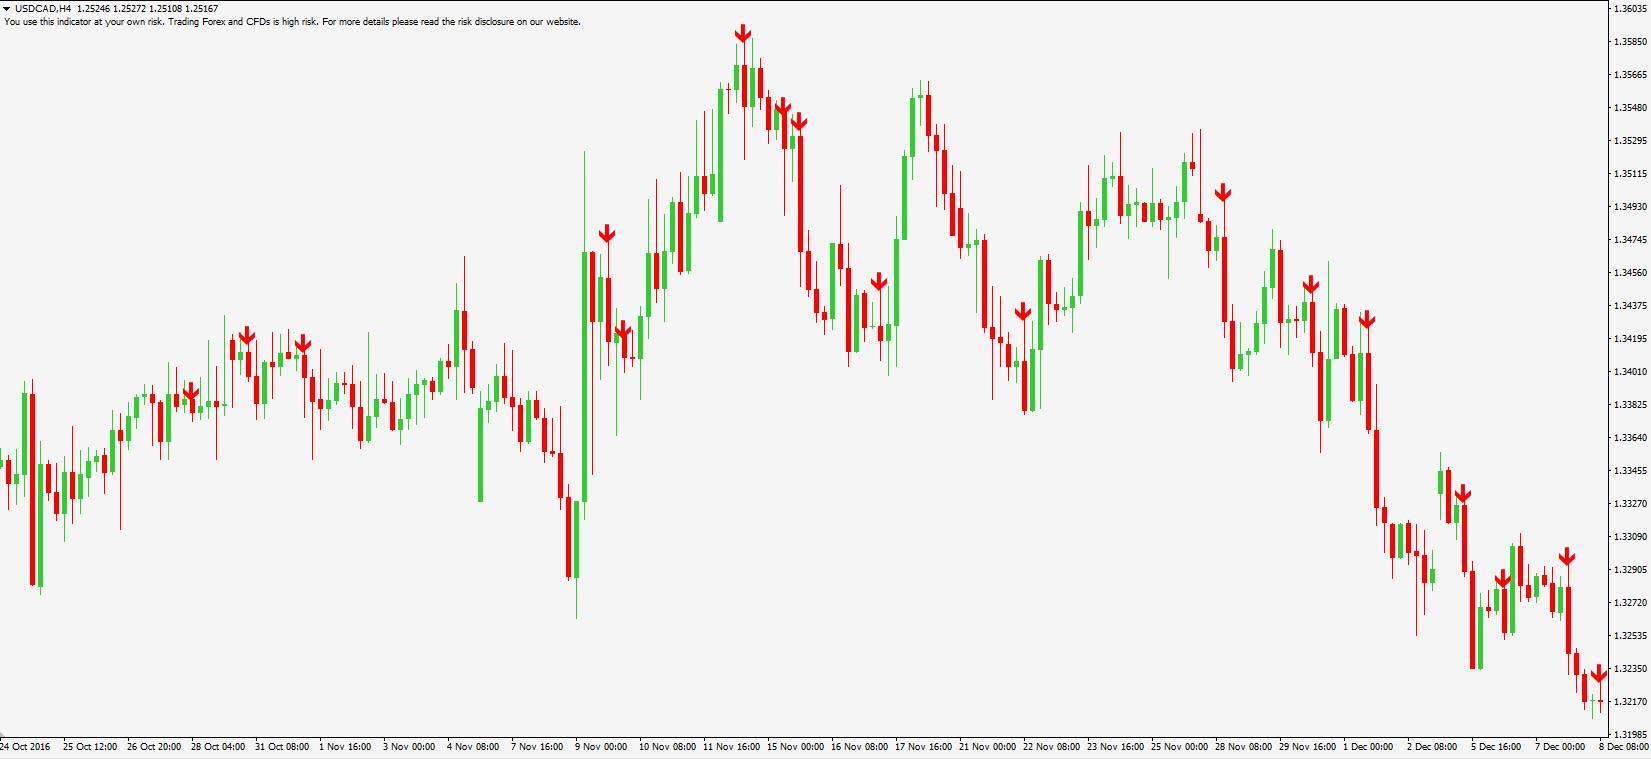 day trading handelssignale cfd trading indikatoren